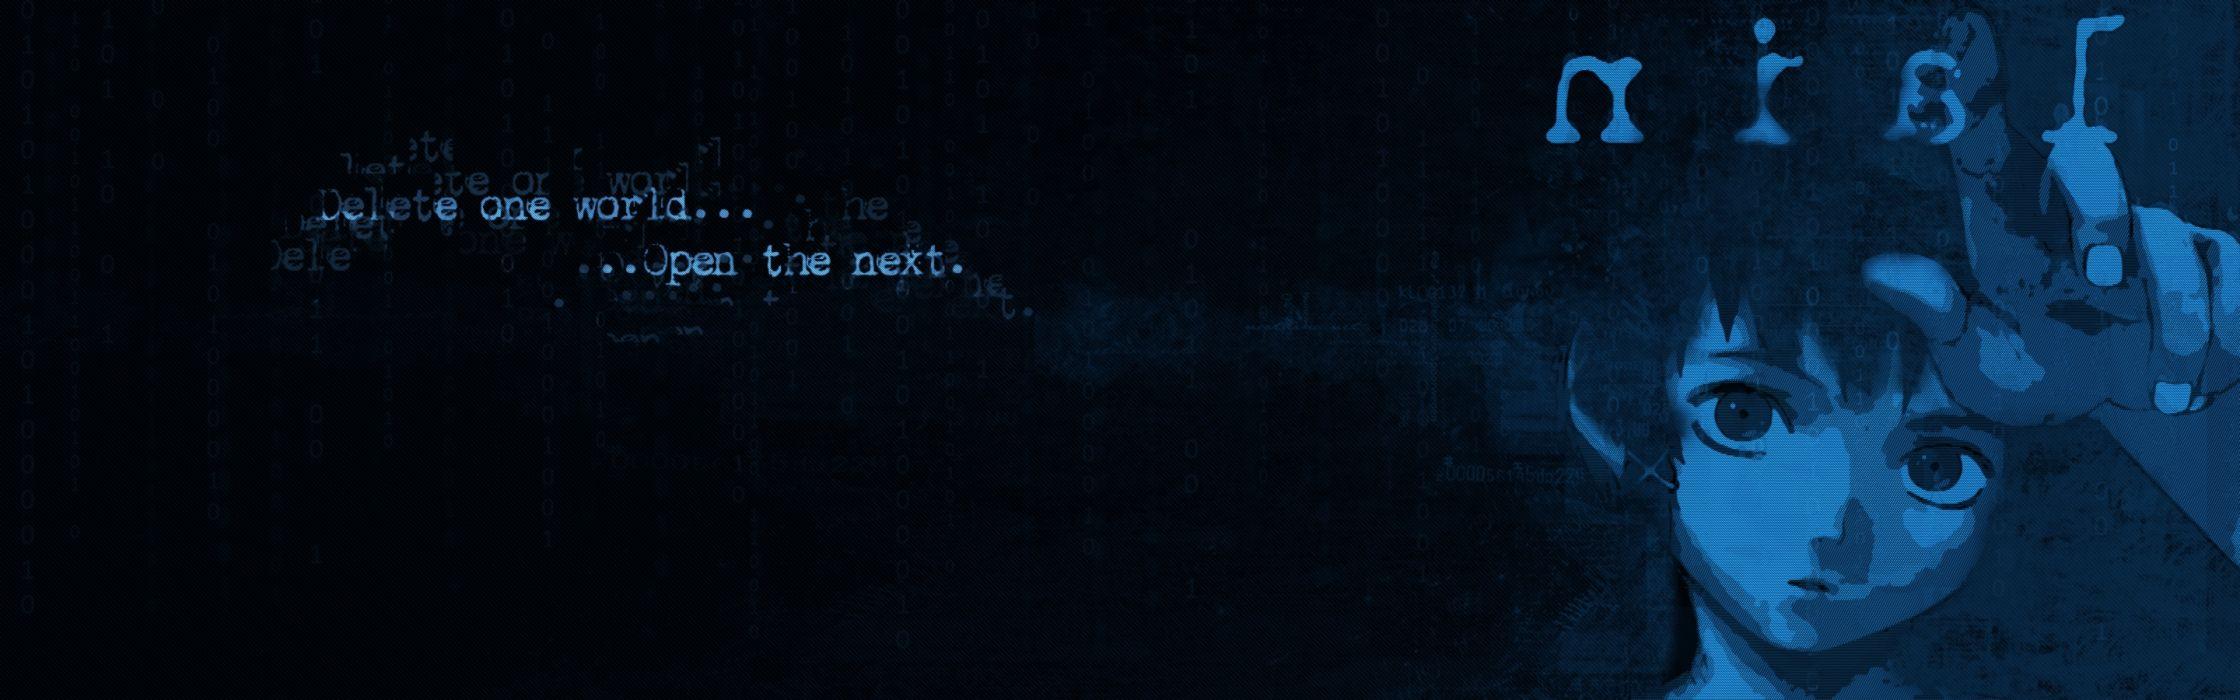 blue text Serial Experiments Lain Iwakura Lain anime anime girls wallpaper